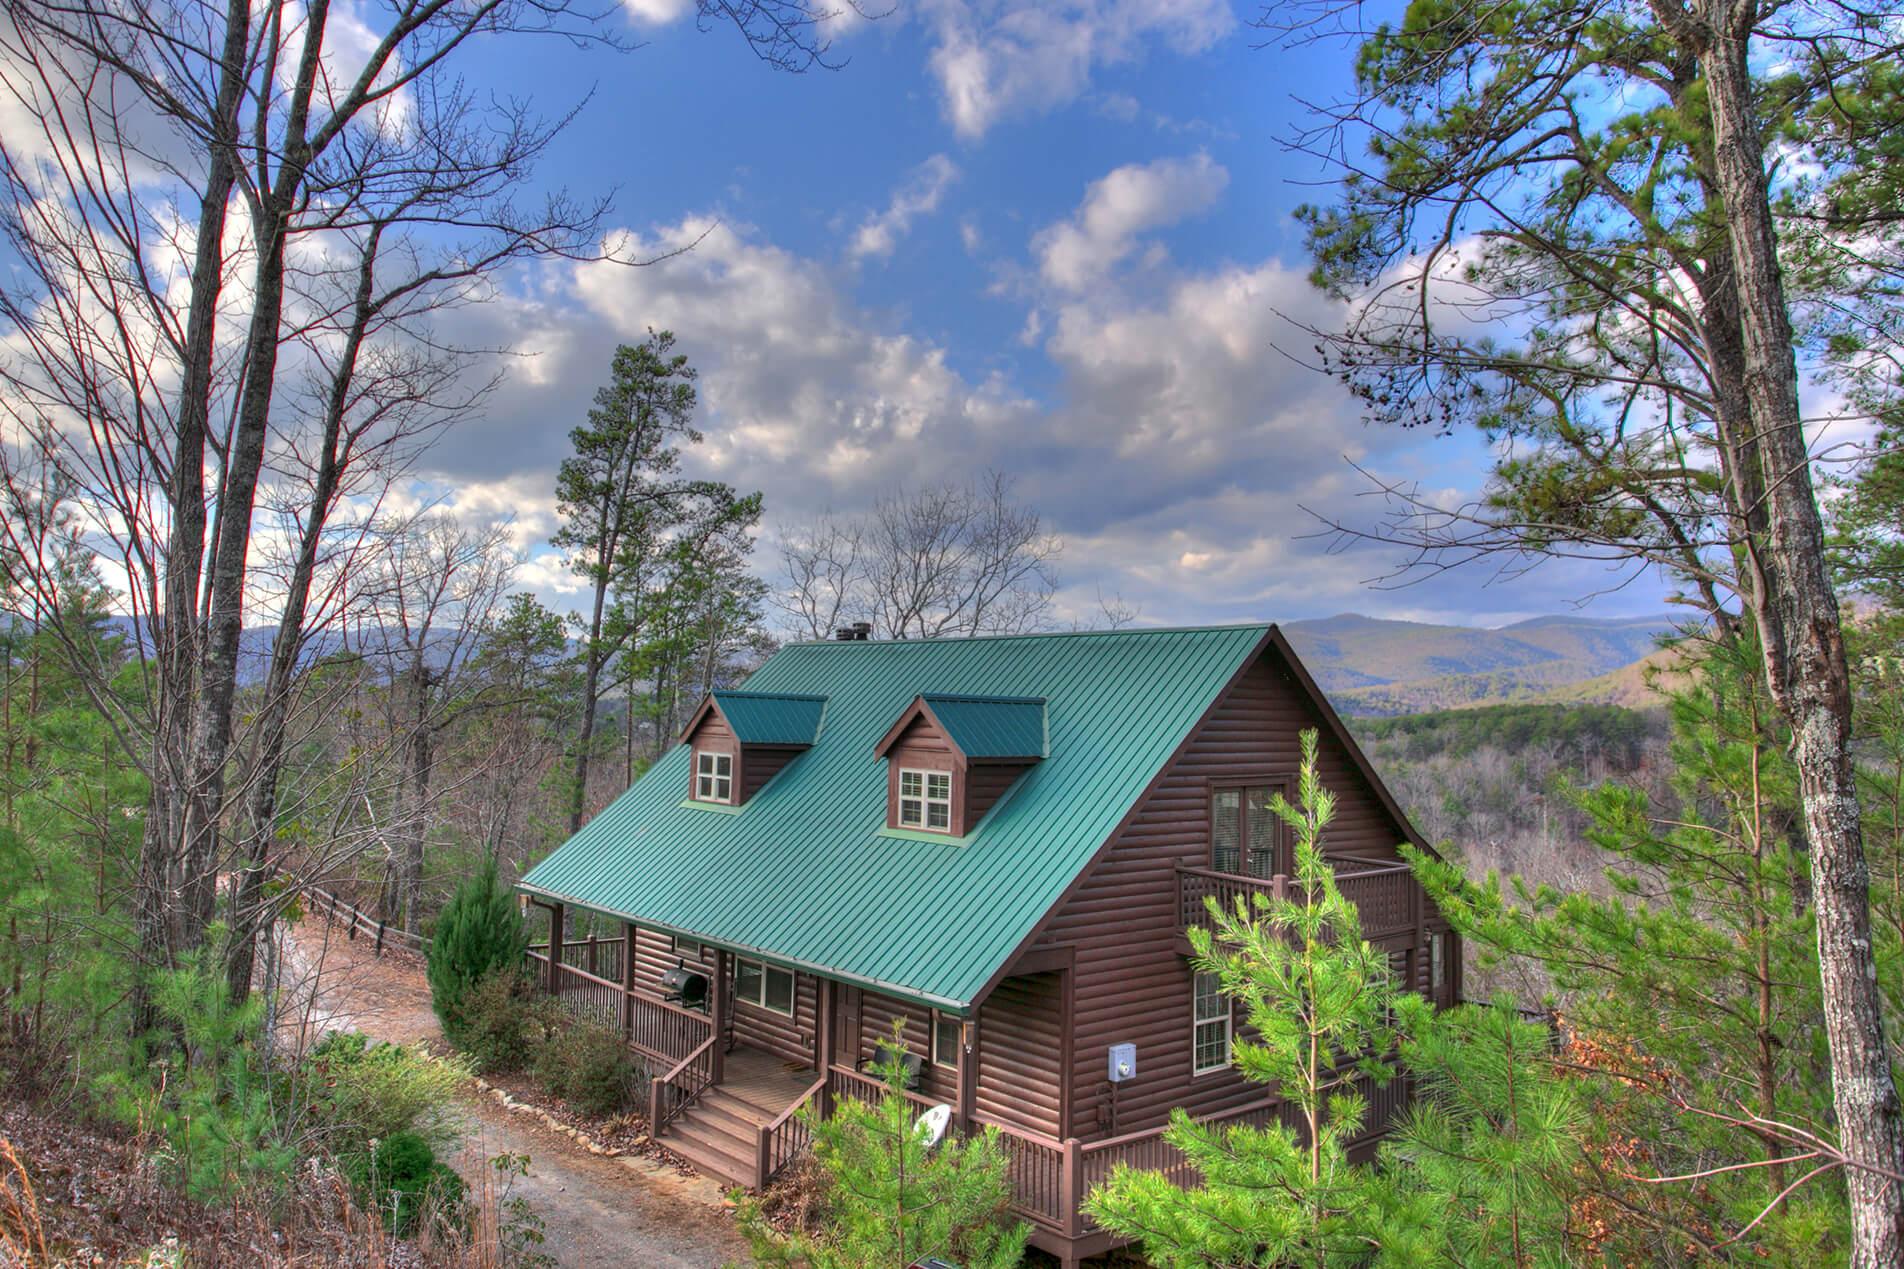 Family cabin rental summit in helen ga for Rental cabins in ga